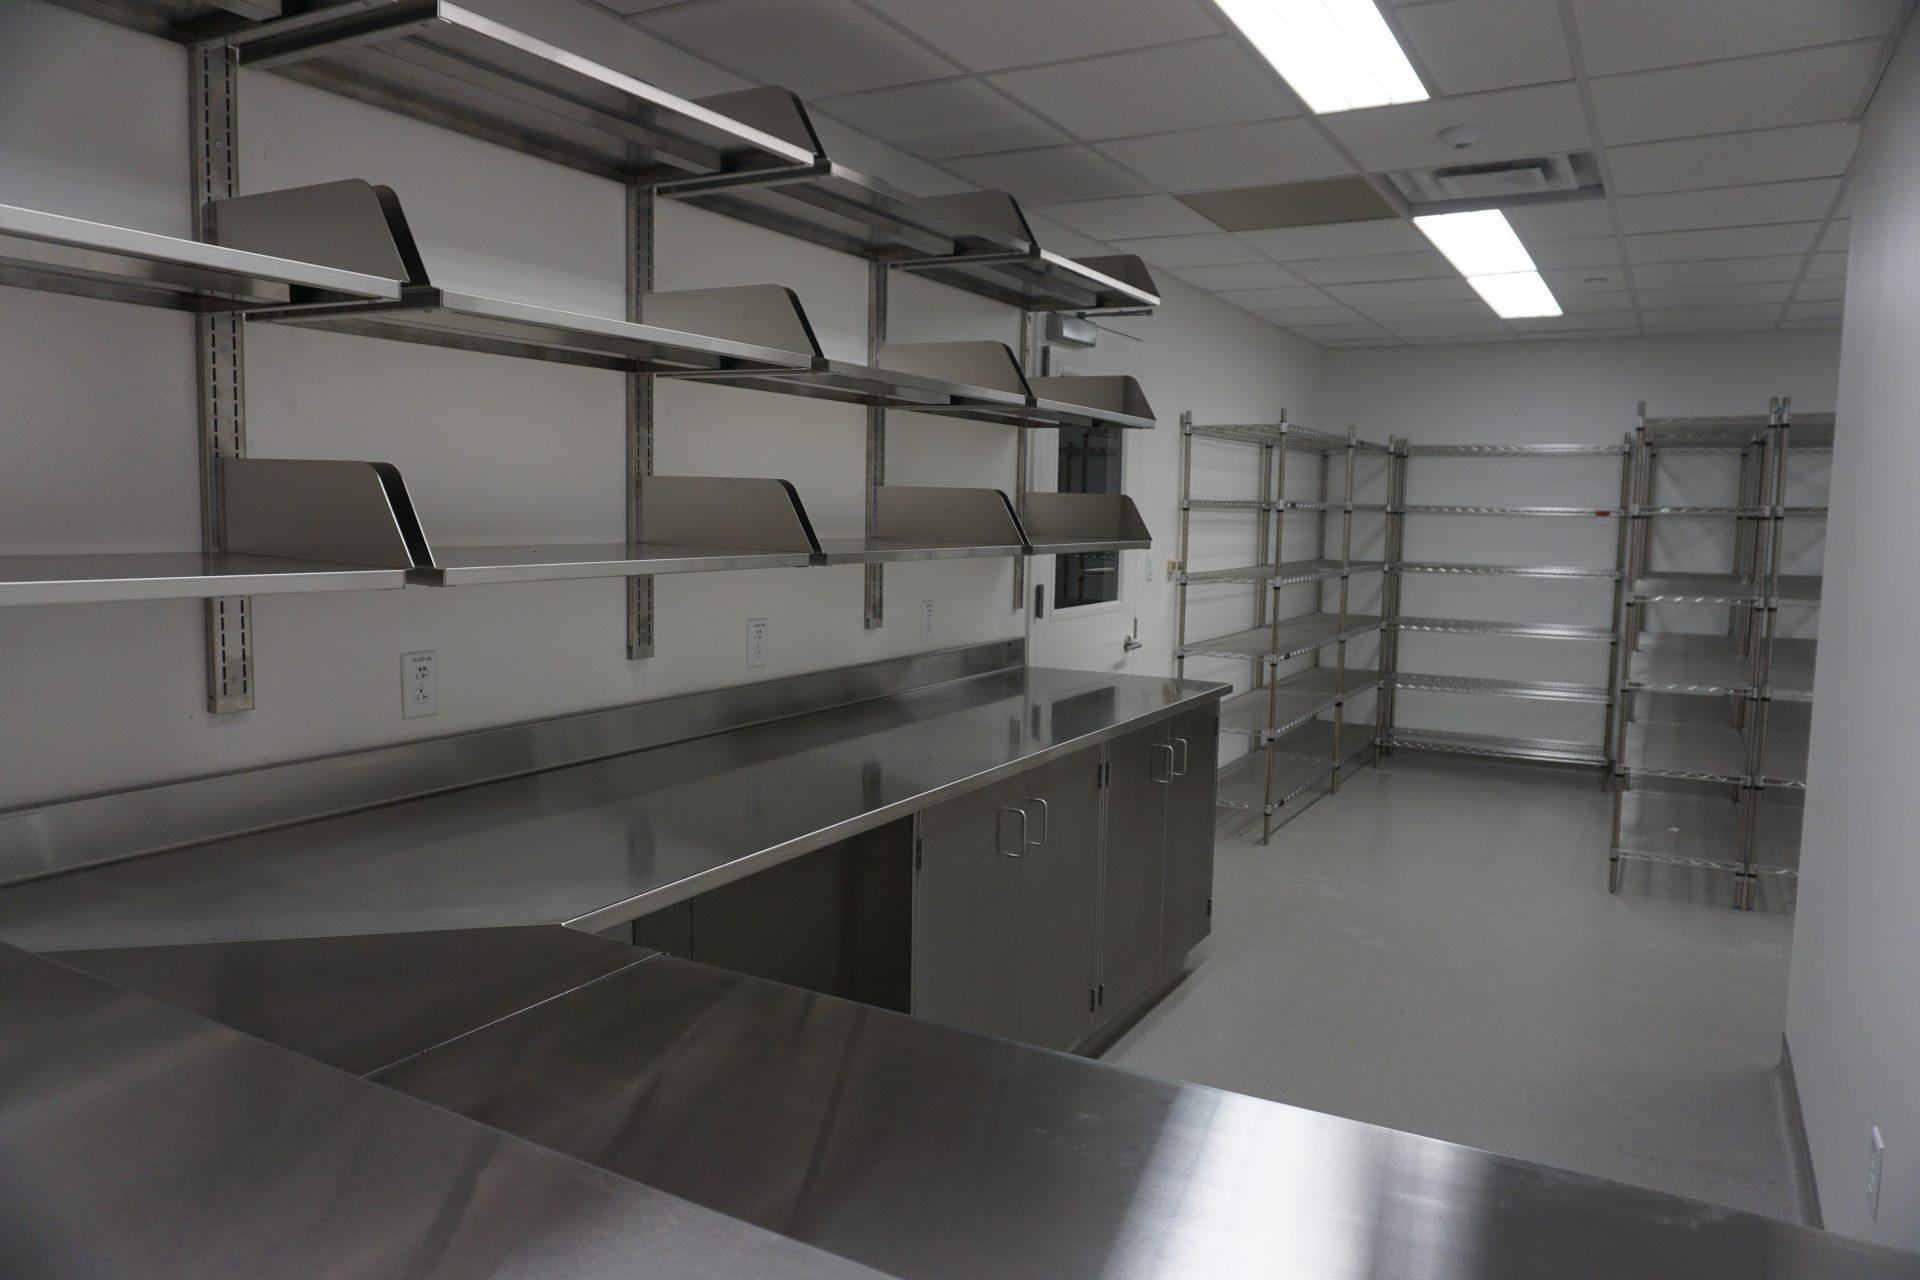 Lab Work Surfaces in Rutgers University SDM- Newark, NJ